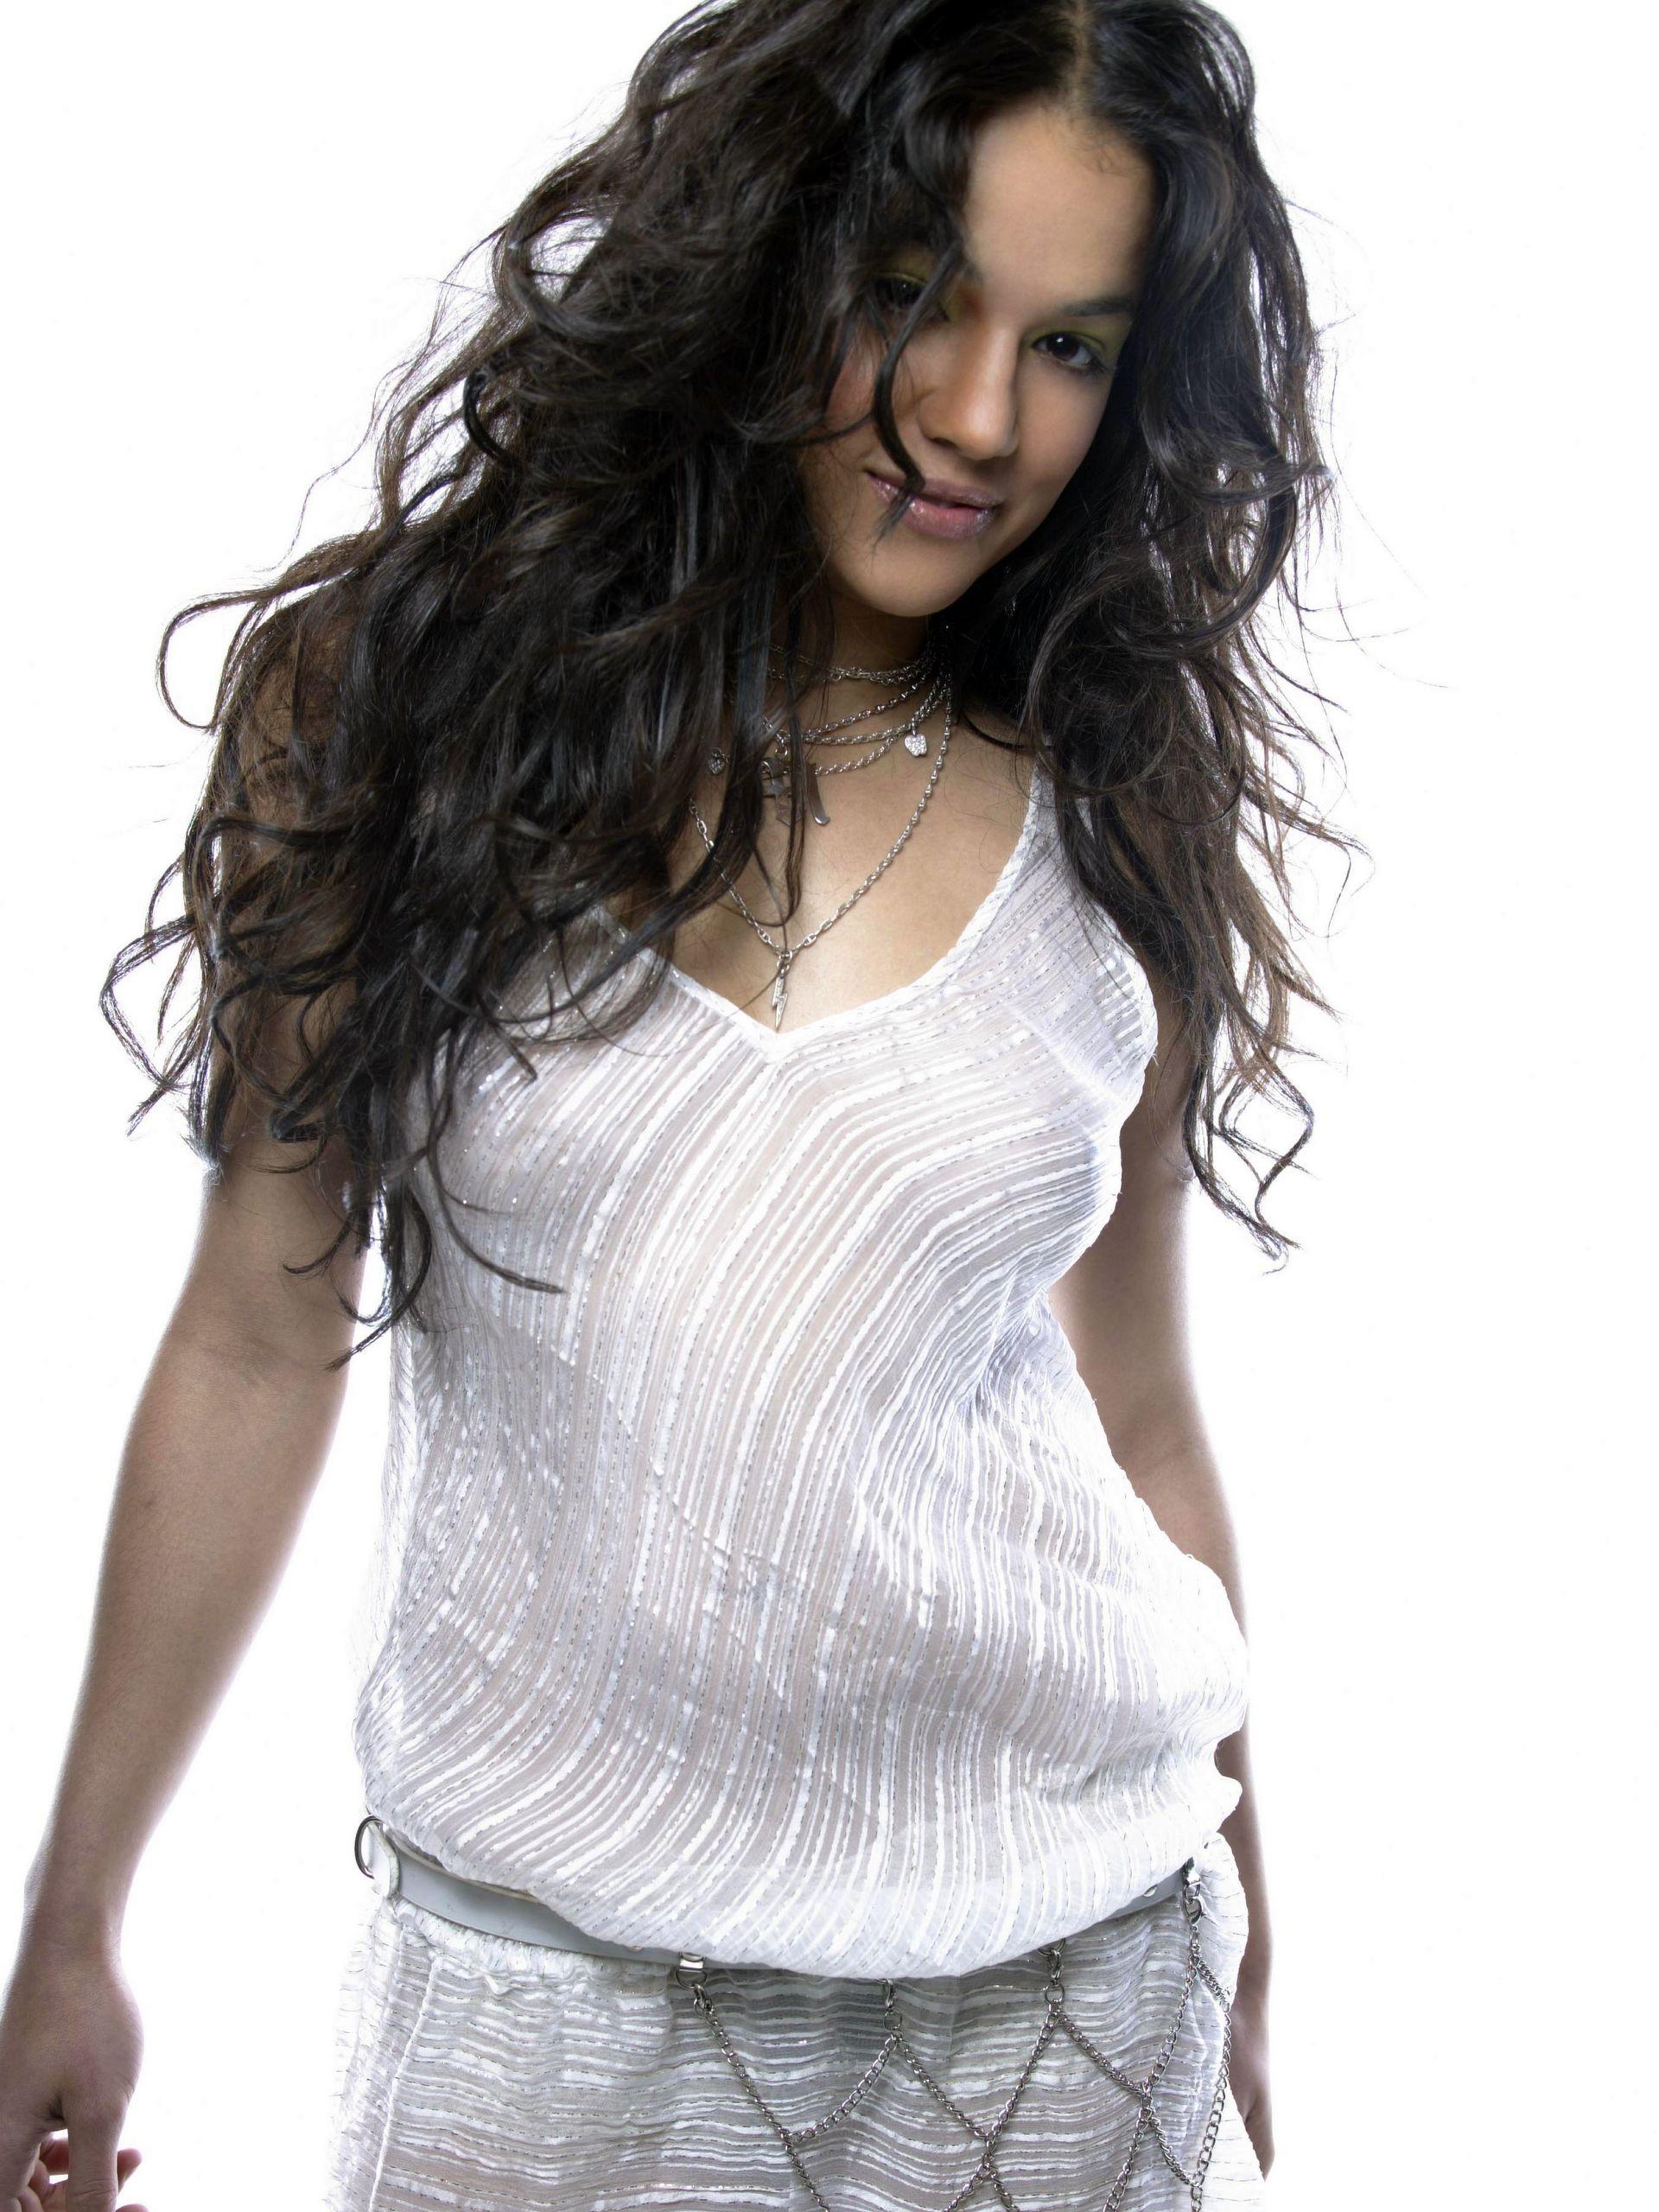 Michelle in 2003 - Michelle Rodriguez Photo (18607128) - Fanpop